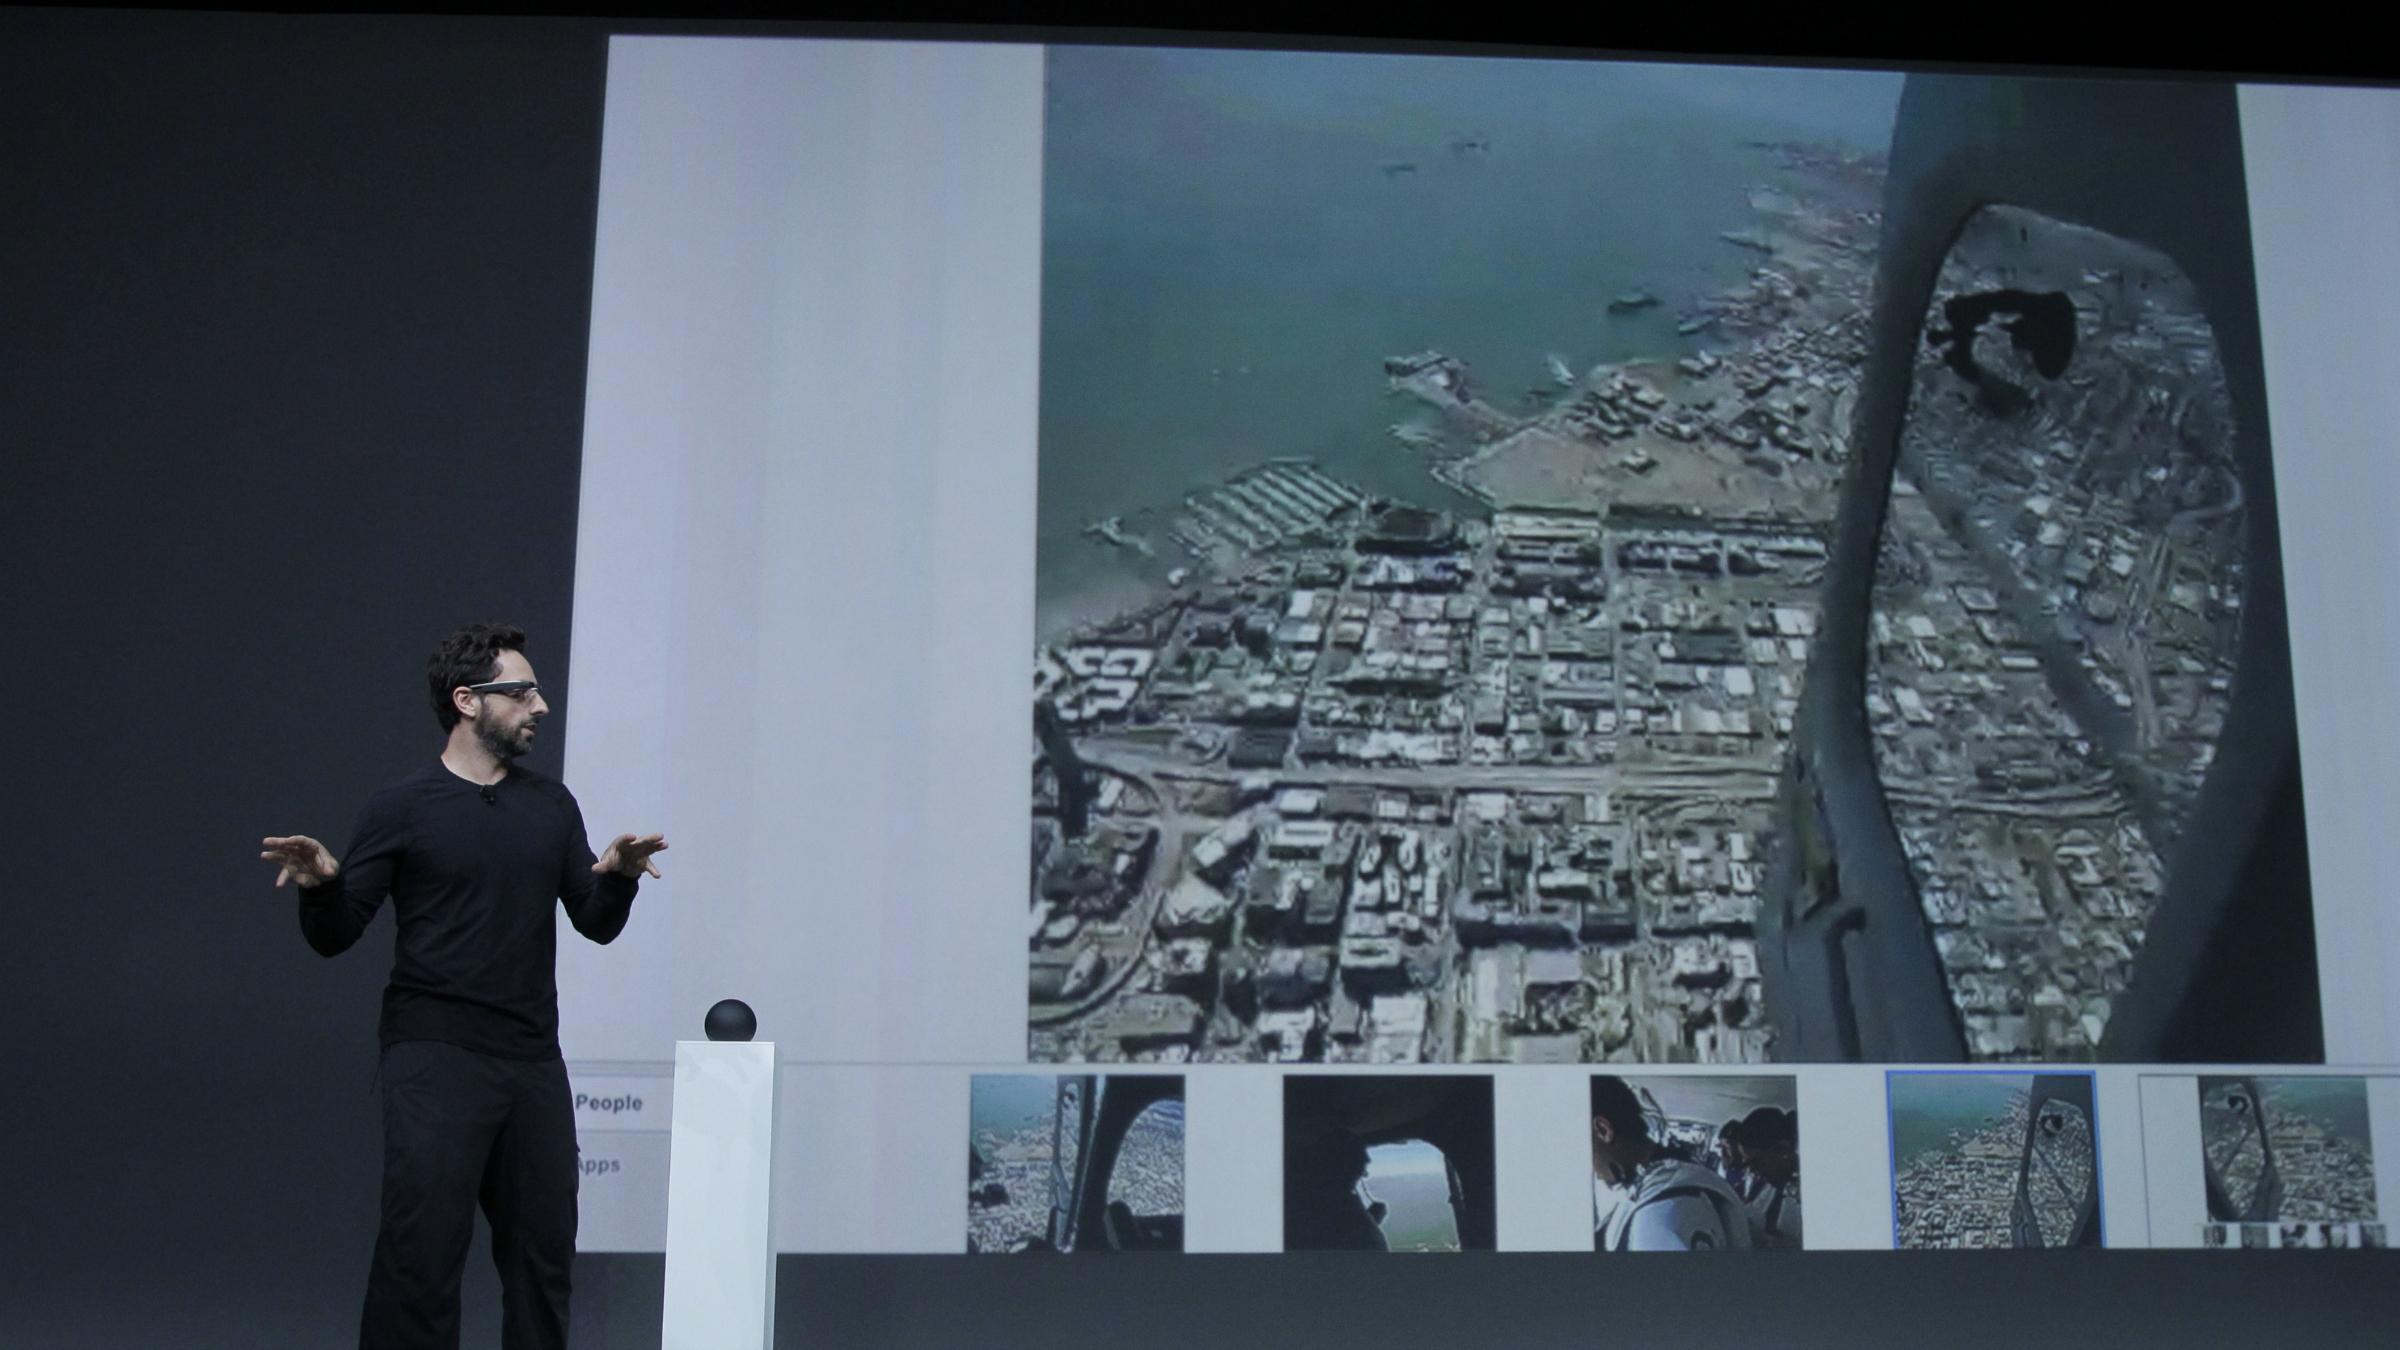 Google Glass display